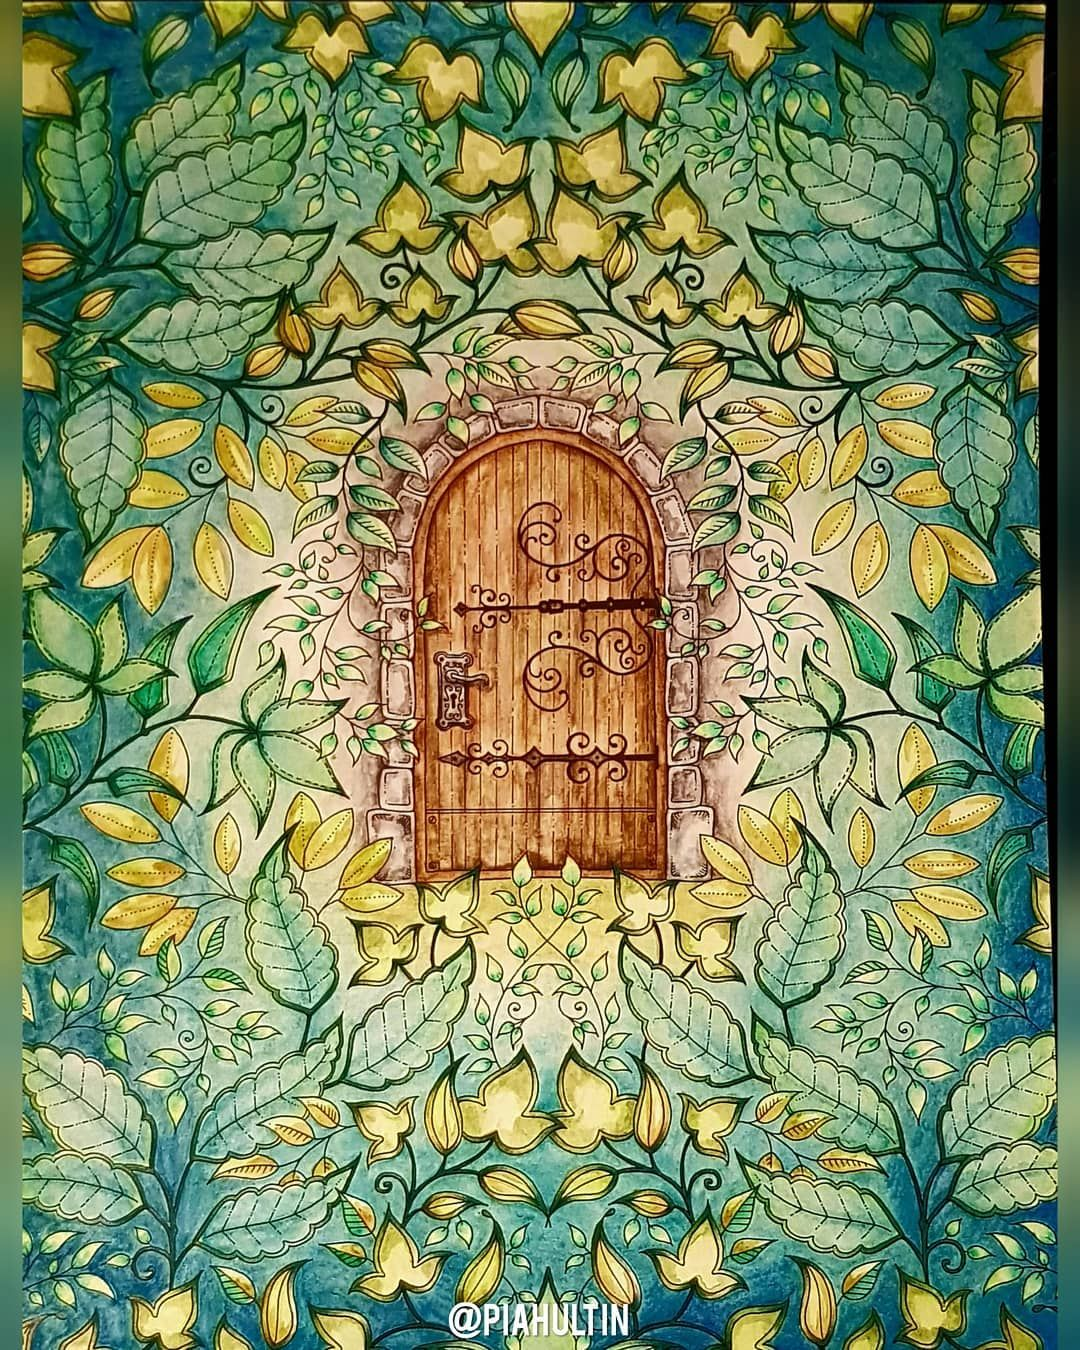 Pia Hultin On Instagram Hemliga Tradgarden Secret Garden Cover By Johanna B Johanna Basford Secret Garden Basford Secret Garden Johanna Basford Coloring Book